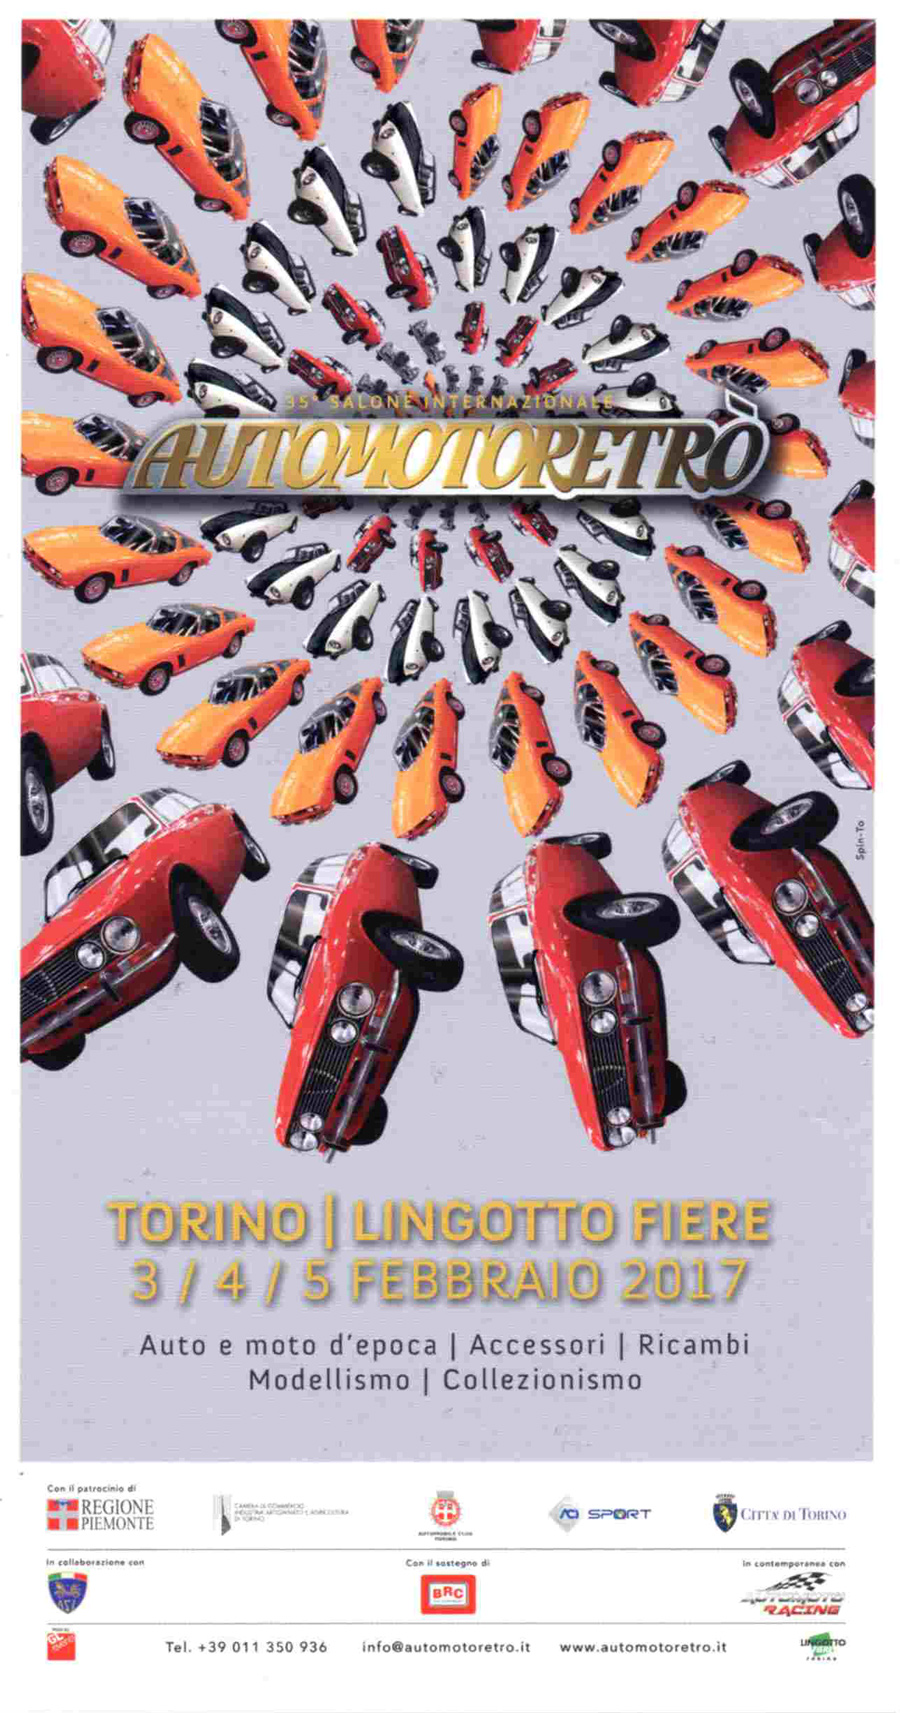 LINGOTTO FIERE - TORINO - AUTOMOTODEPOCA